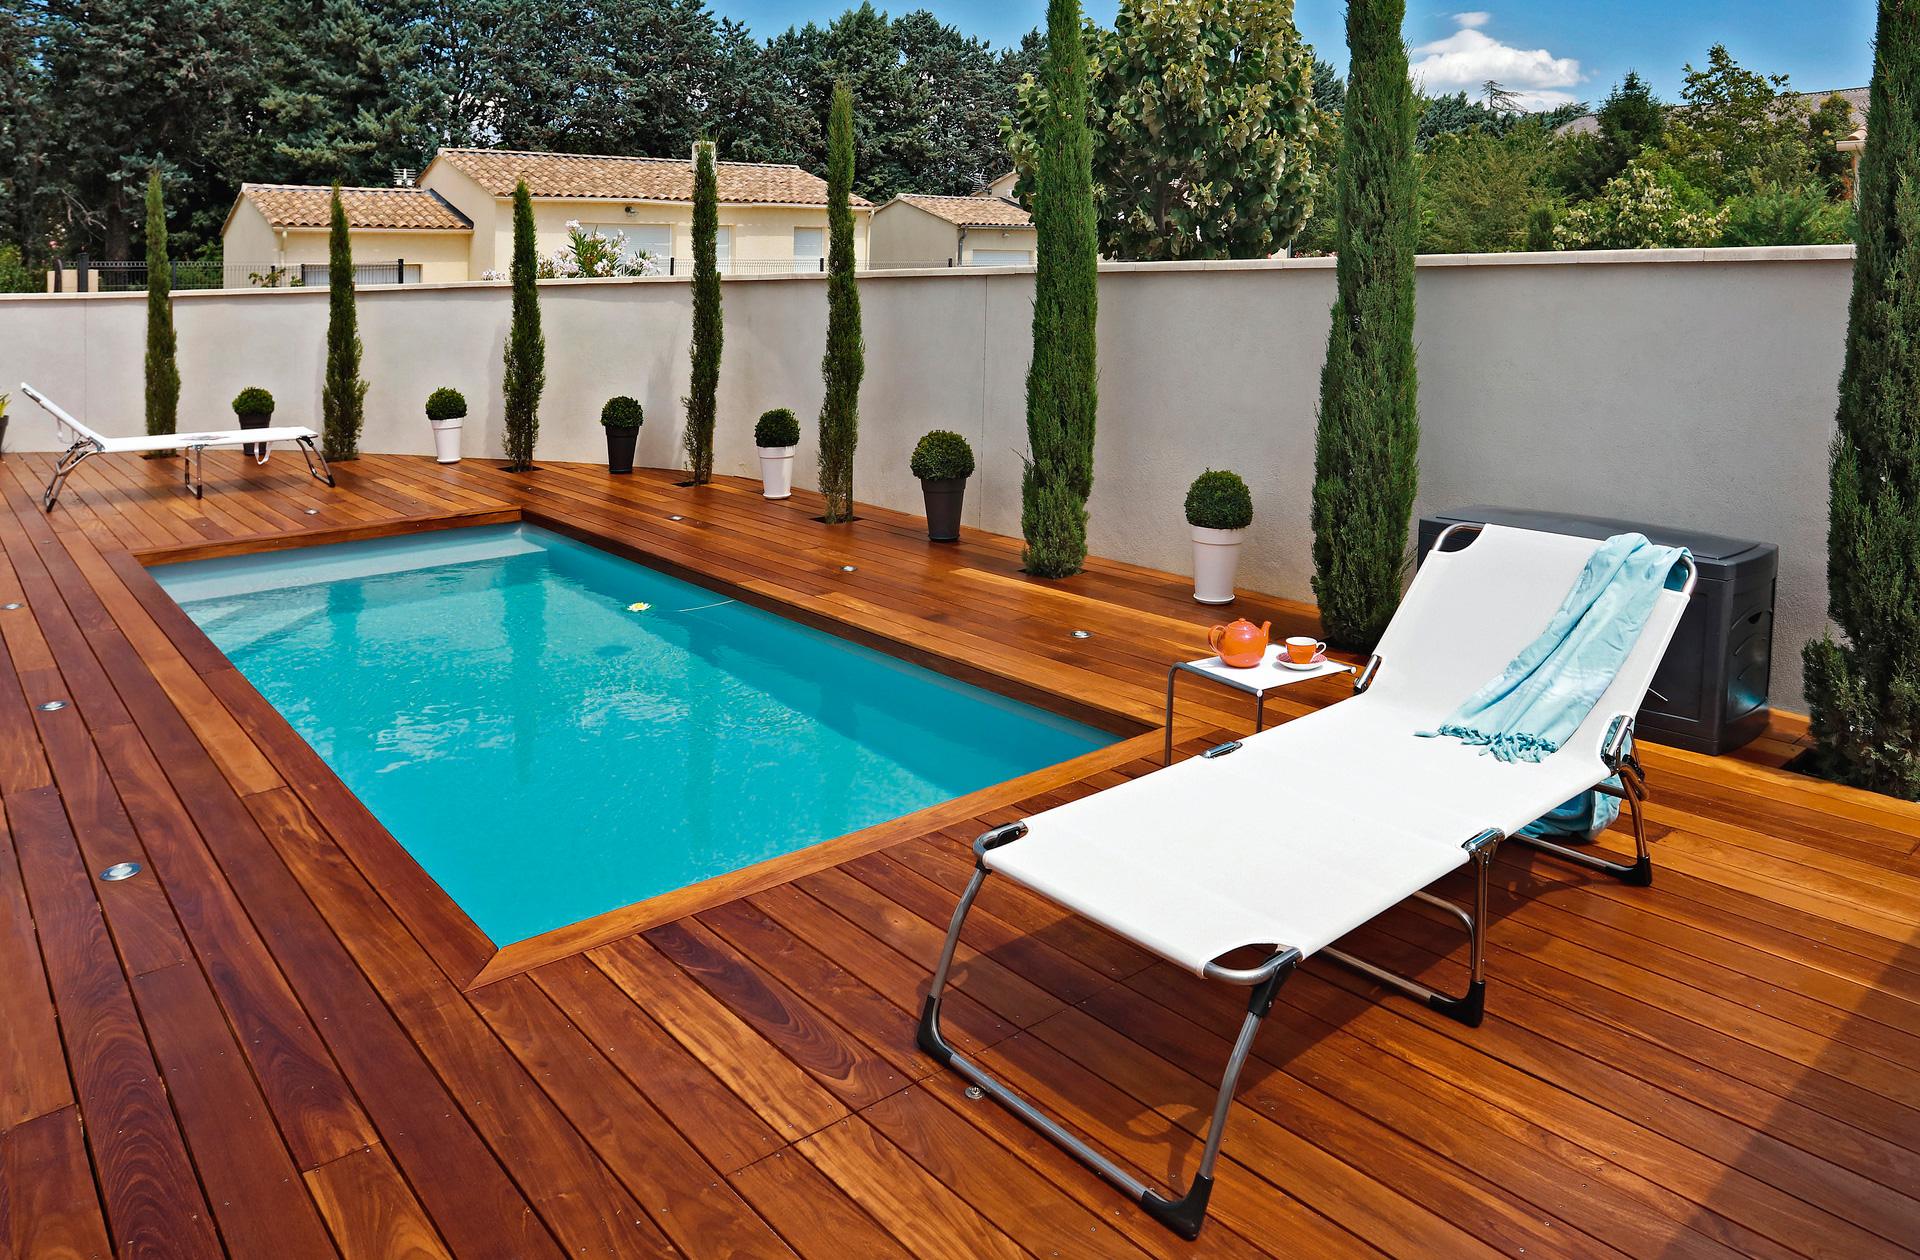 pool bildgalerie swimmingpool referenzen desjoyaux pools. Black Bedroom Furniture Sets. Home Design Ideas